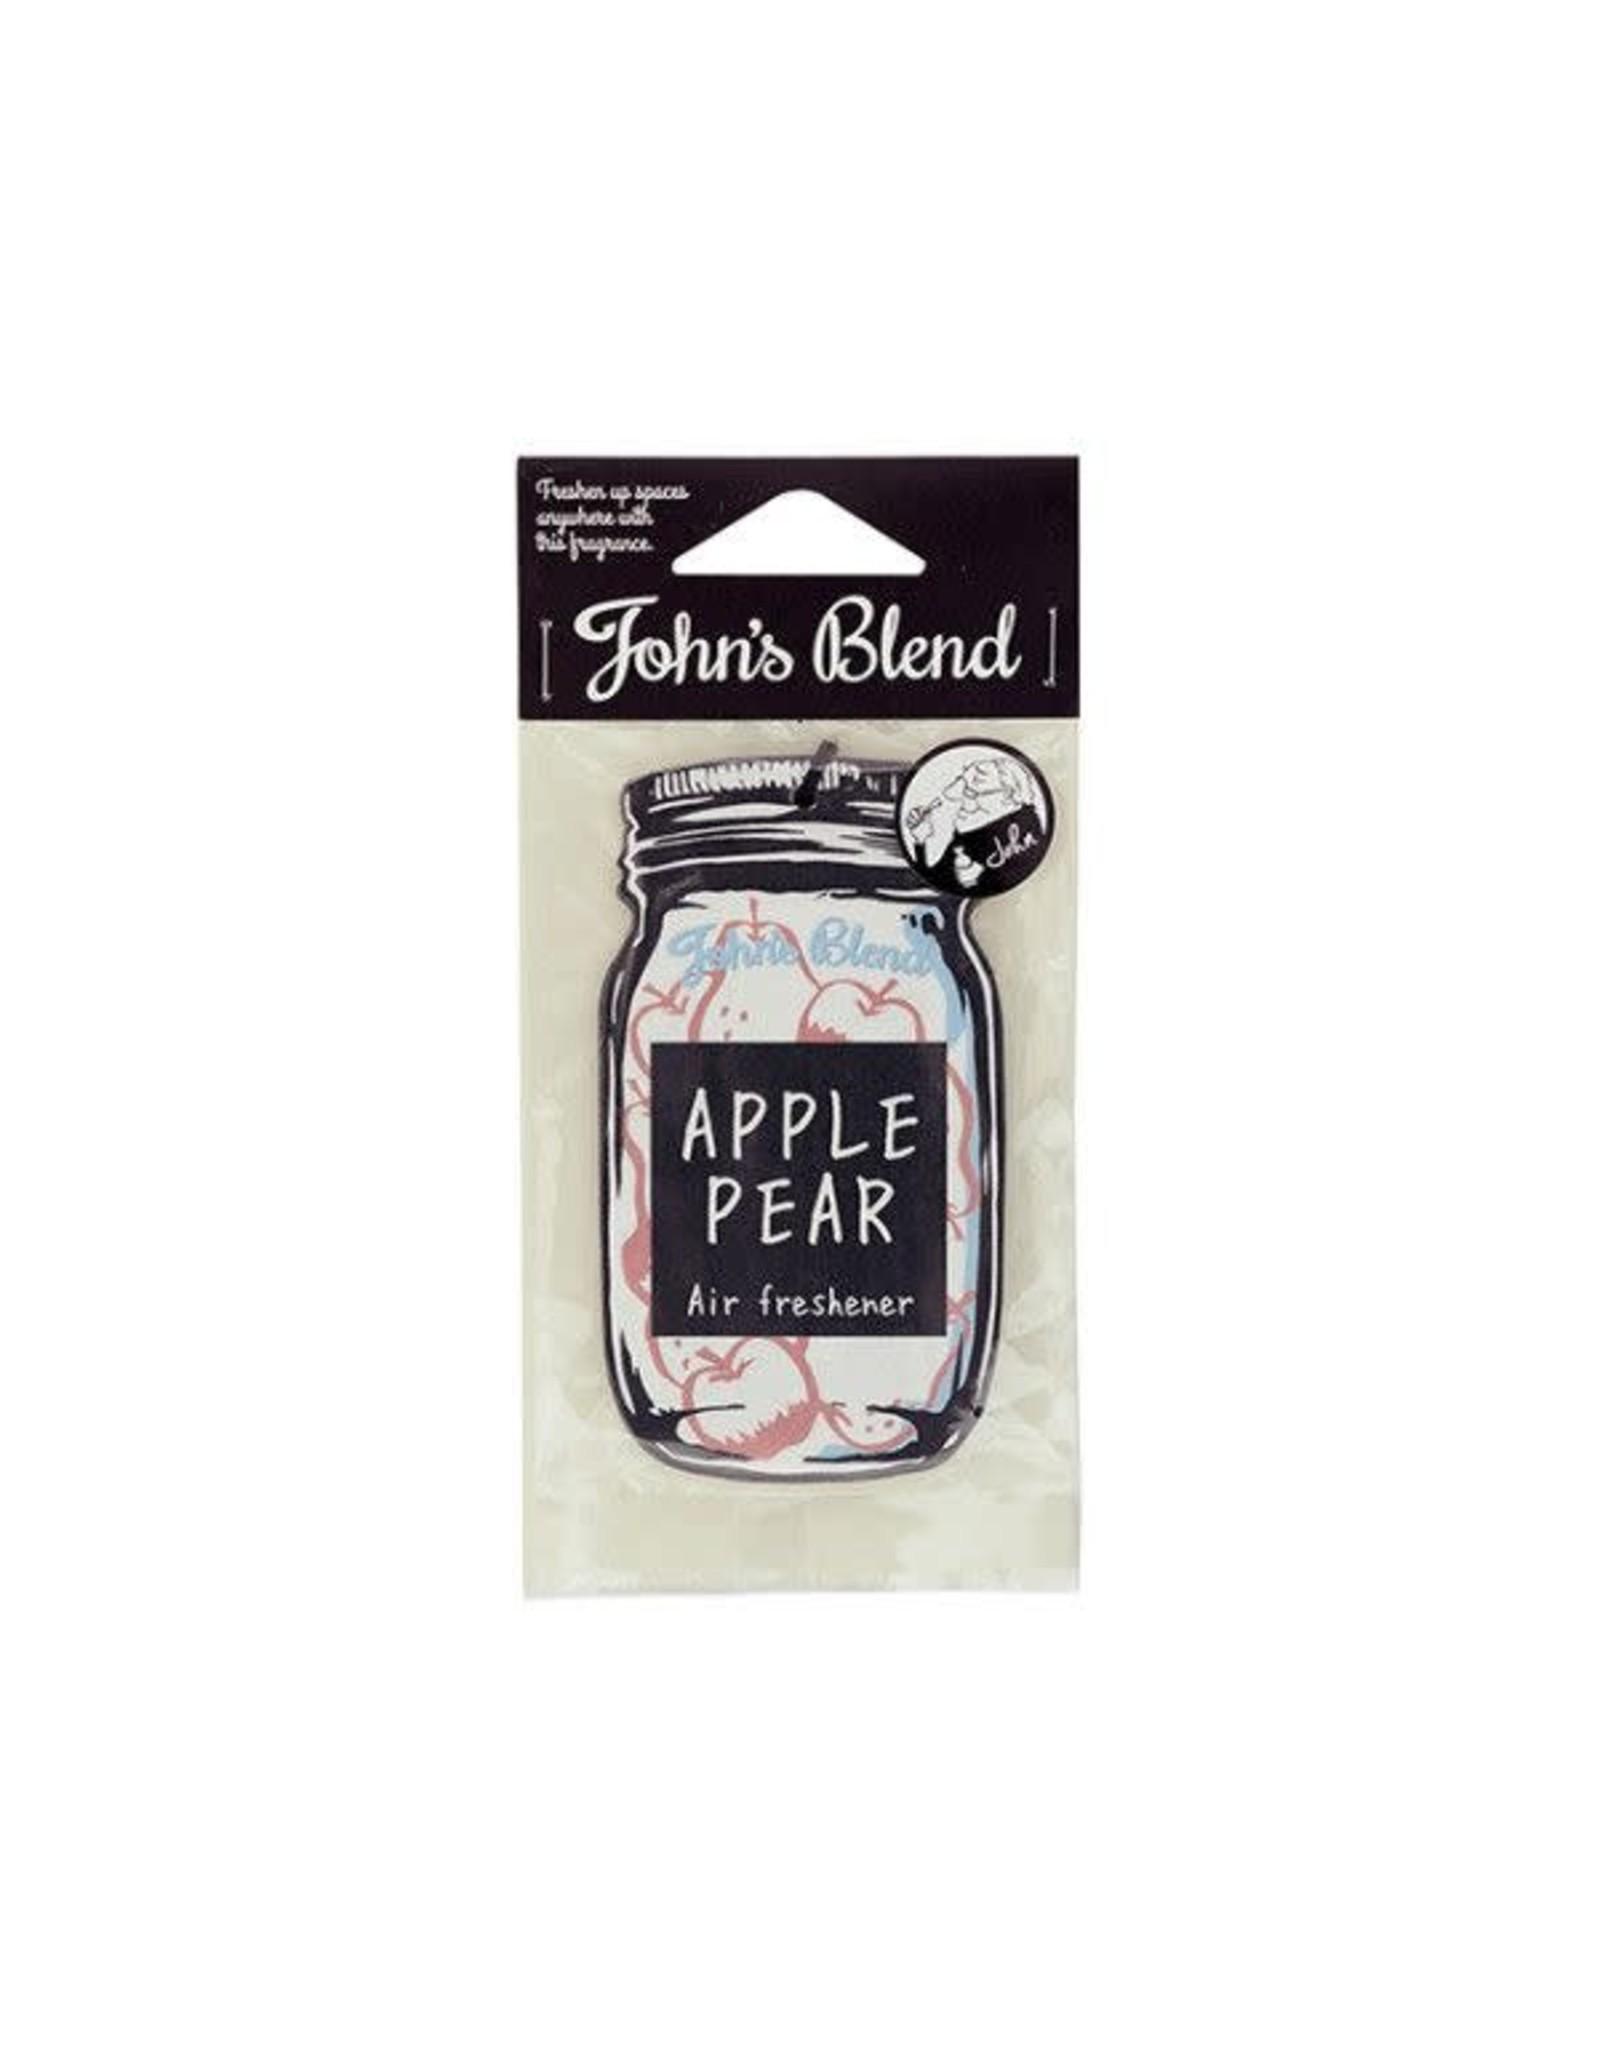 Nol John's Blend Air Freshener Apple Pear